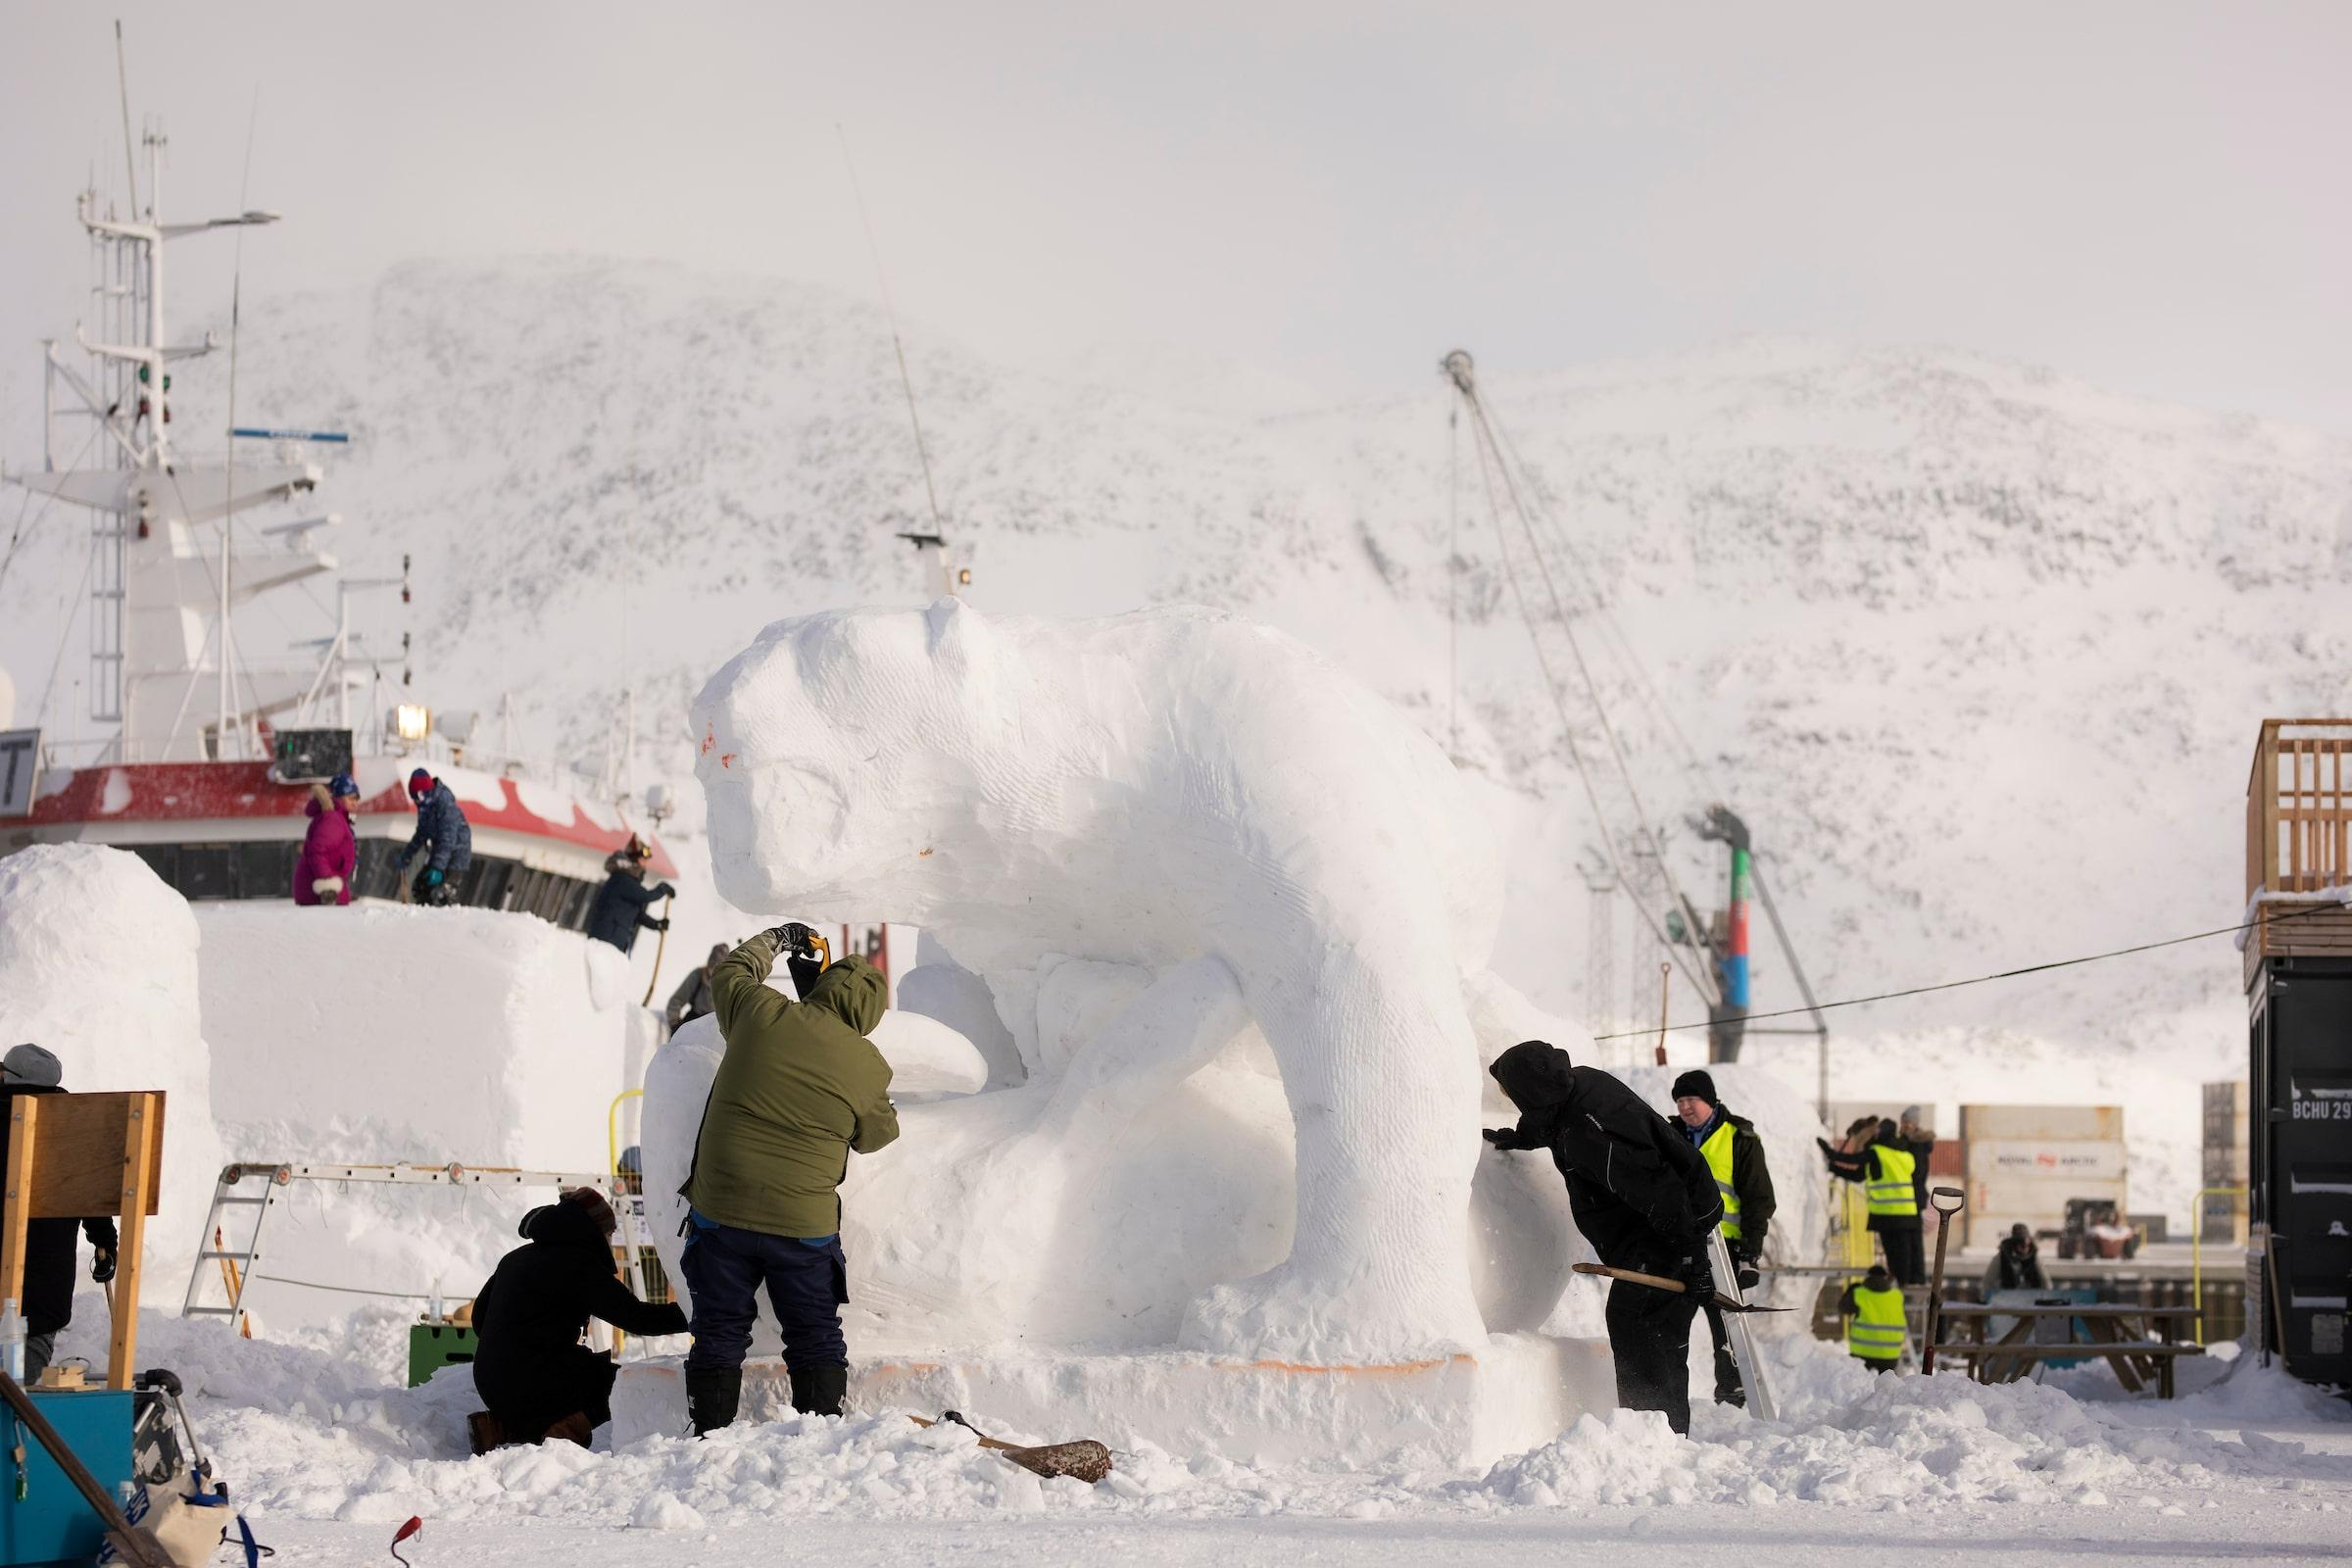 polar bear snow sculpture. Photo - Aningaaq R. Carlsen, Visit Greenland